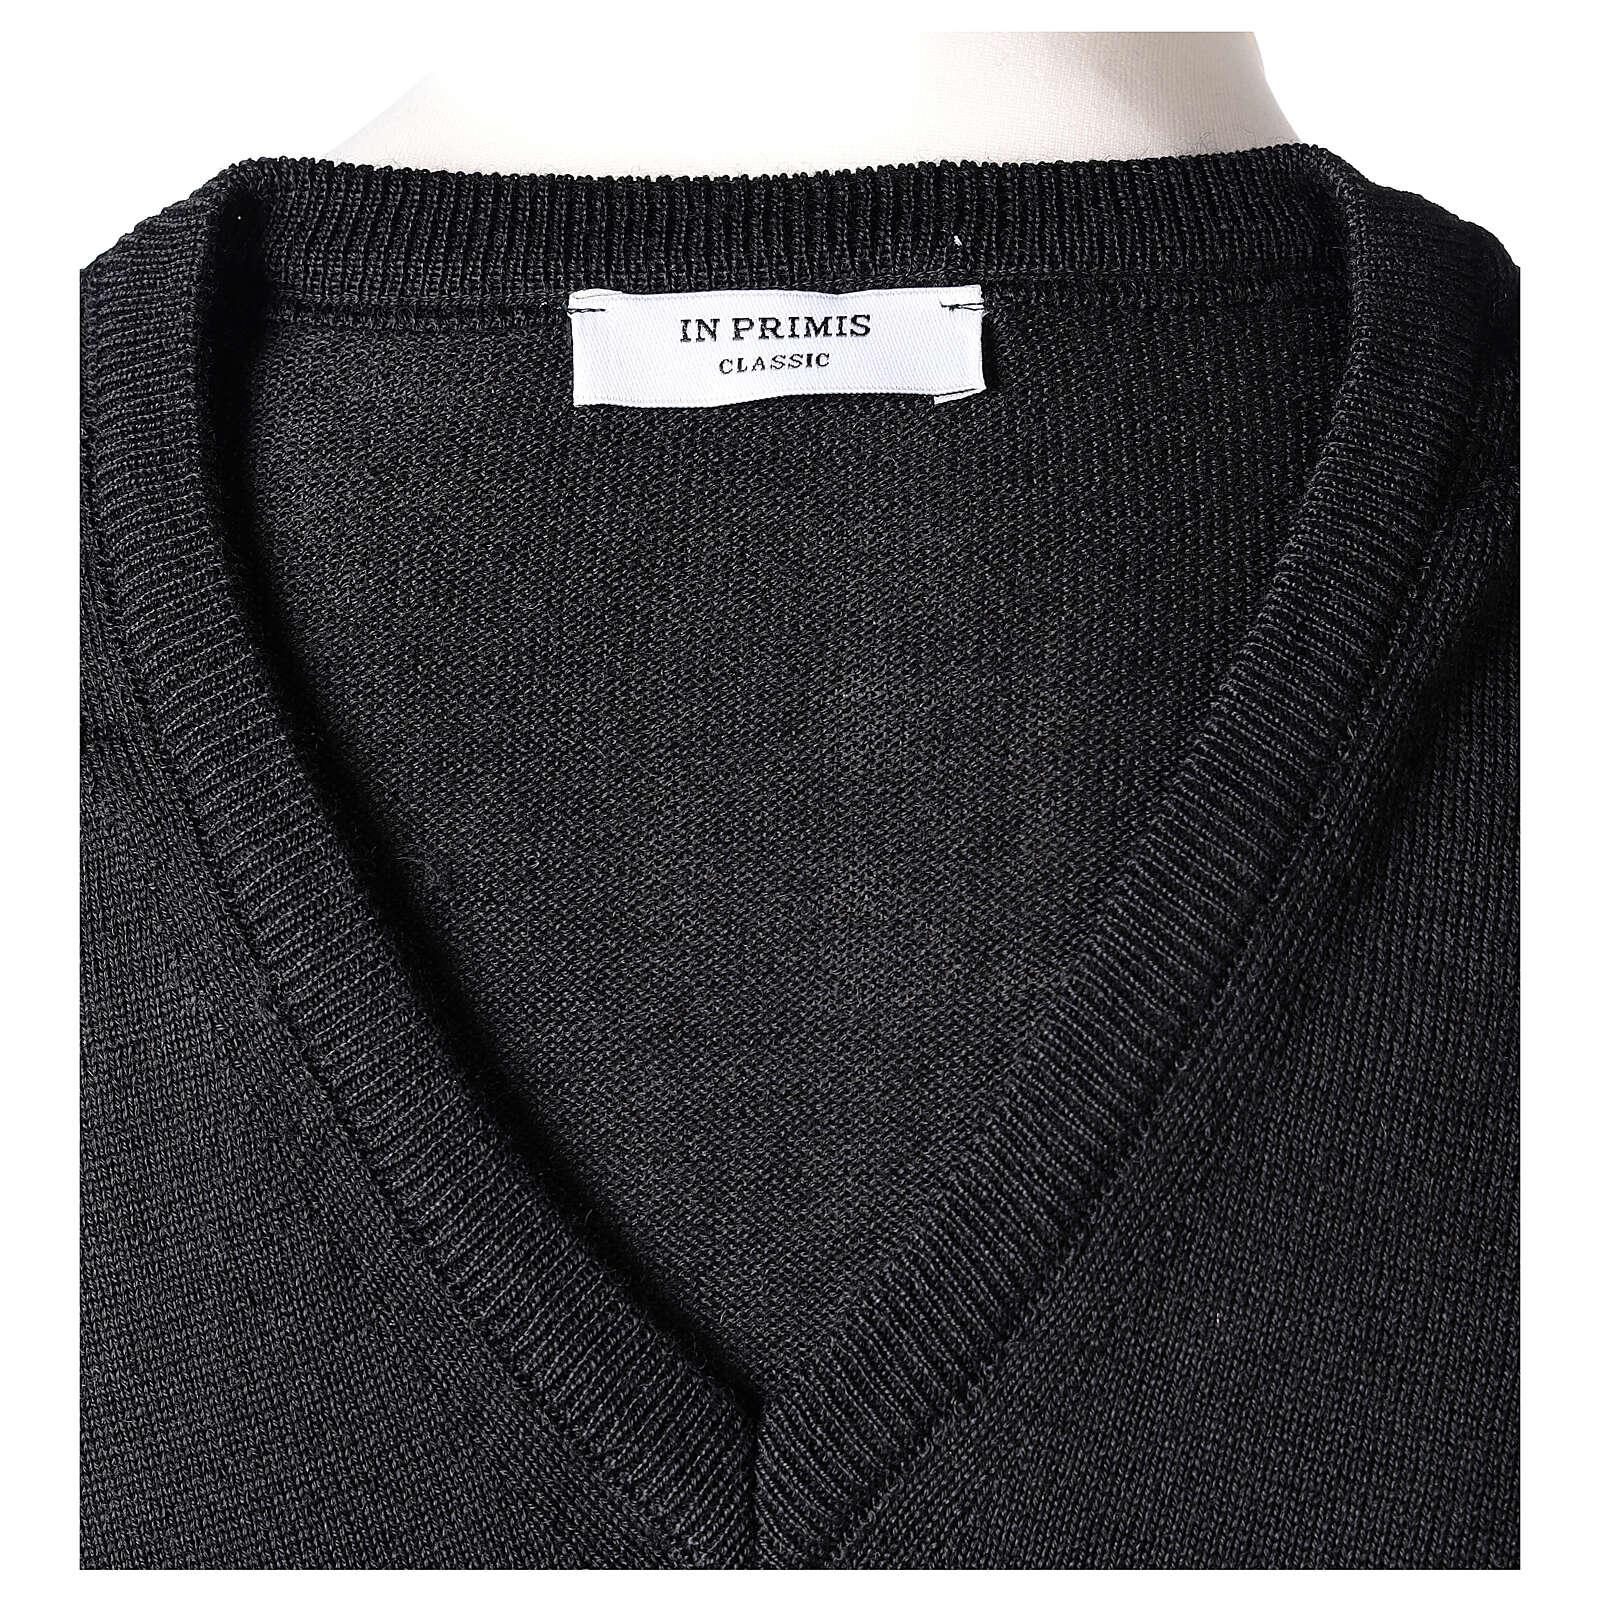 Colete sacerdote preto sem botões tricô plano 50% lã de merino 50% acrílico In Primis 4